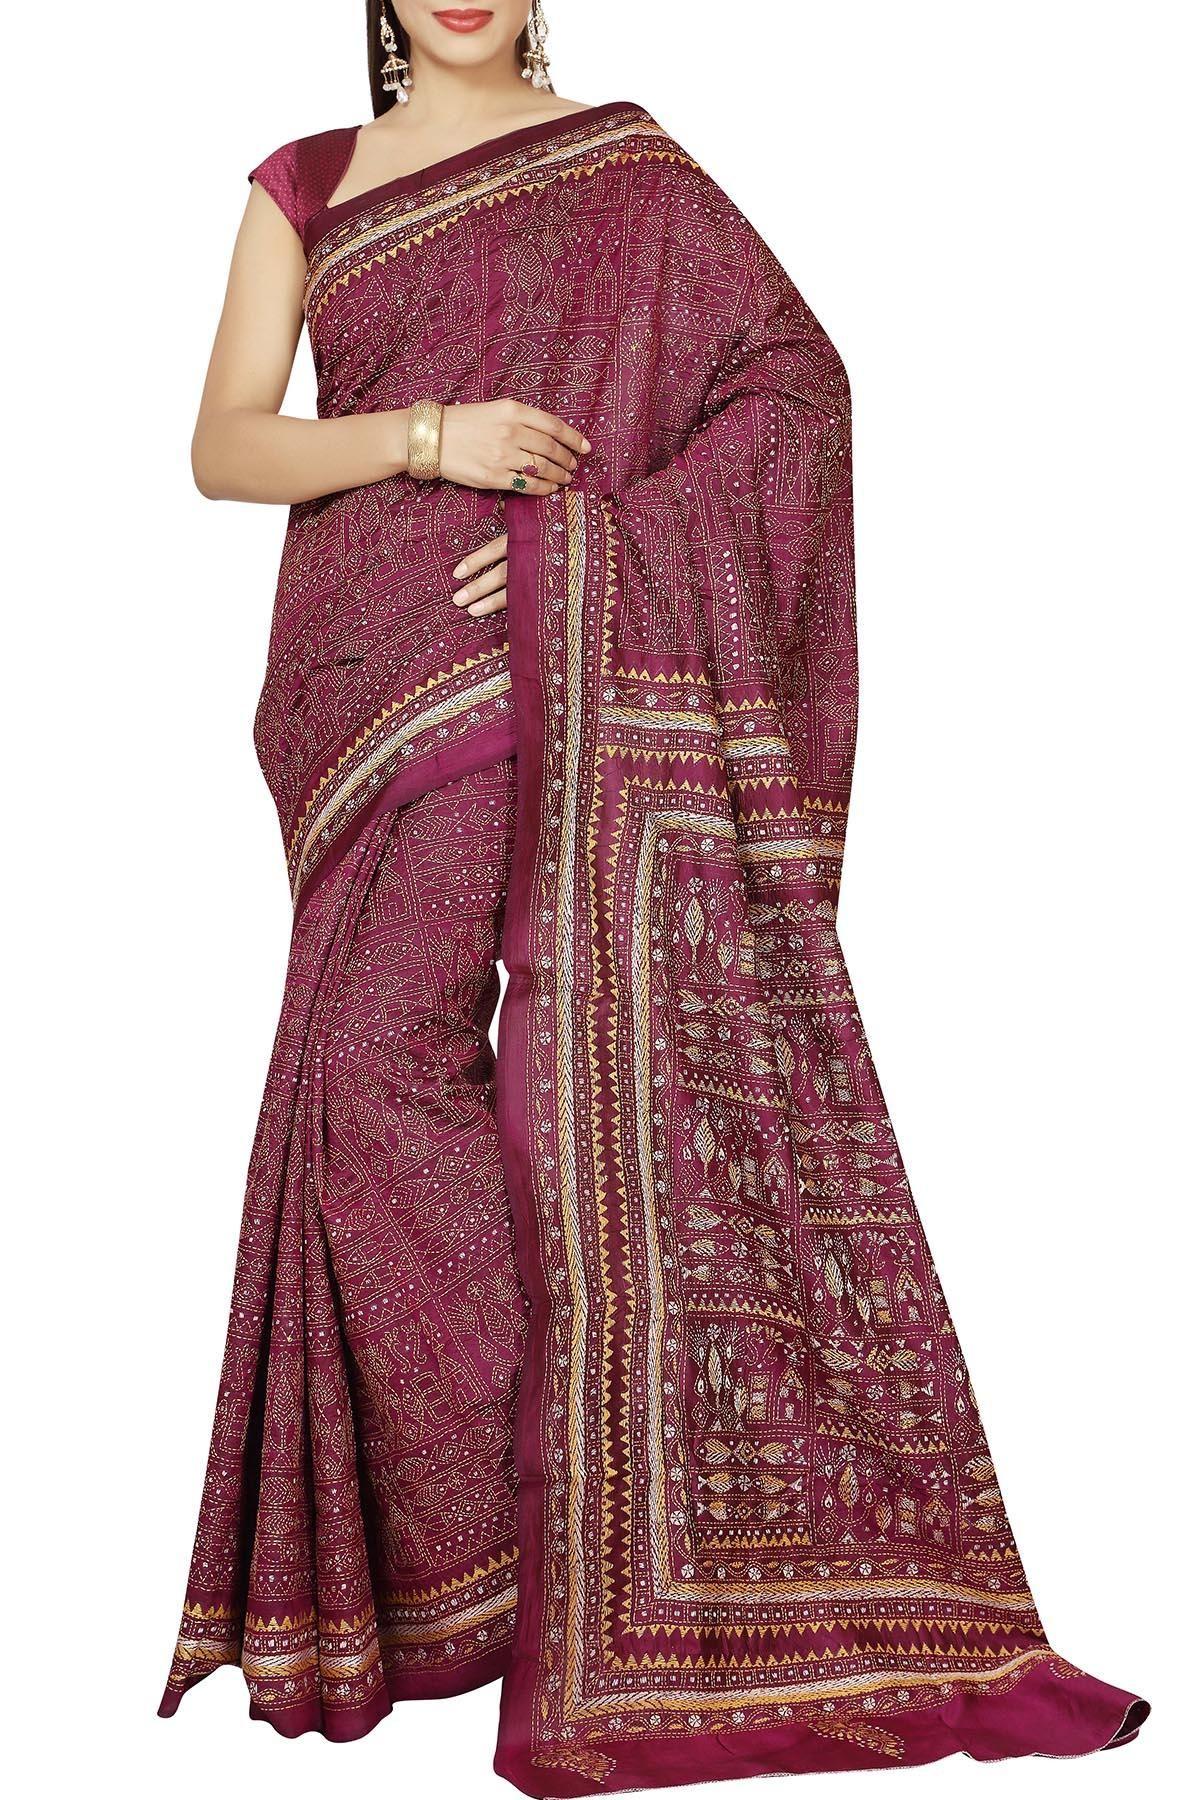 fb56ae8c1e511 Tyrian Purple Meen Nakshi Kantha Soft Silk Saree